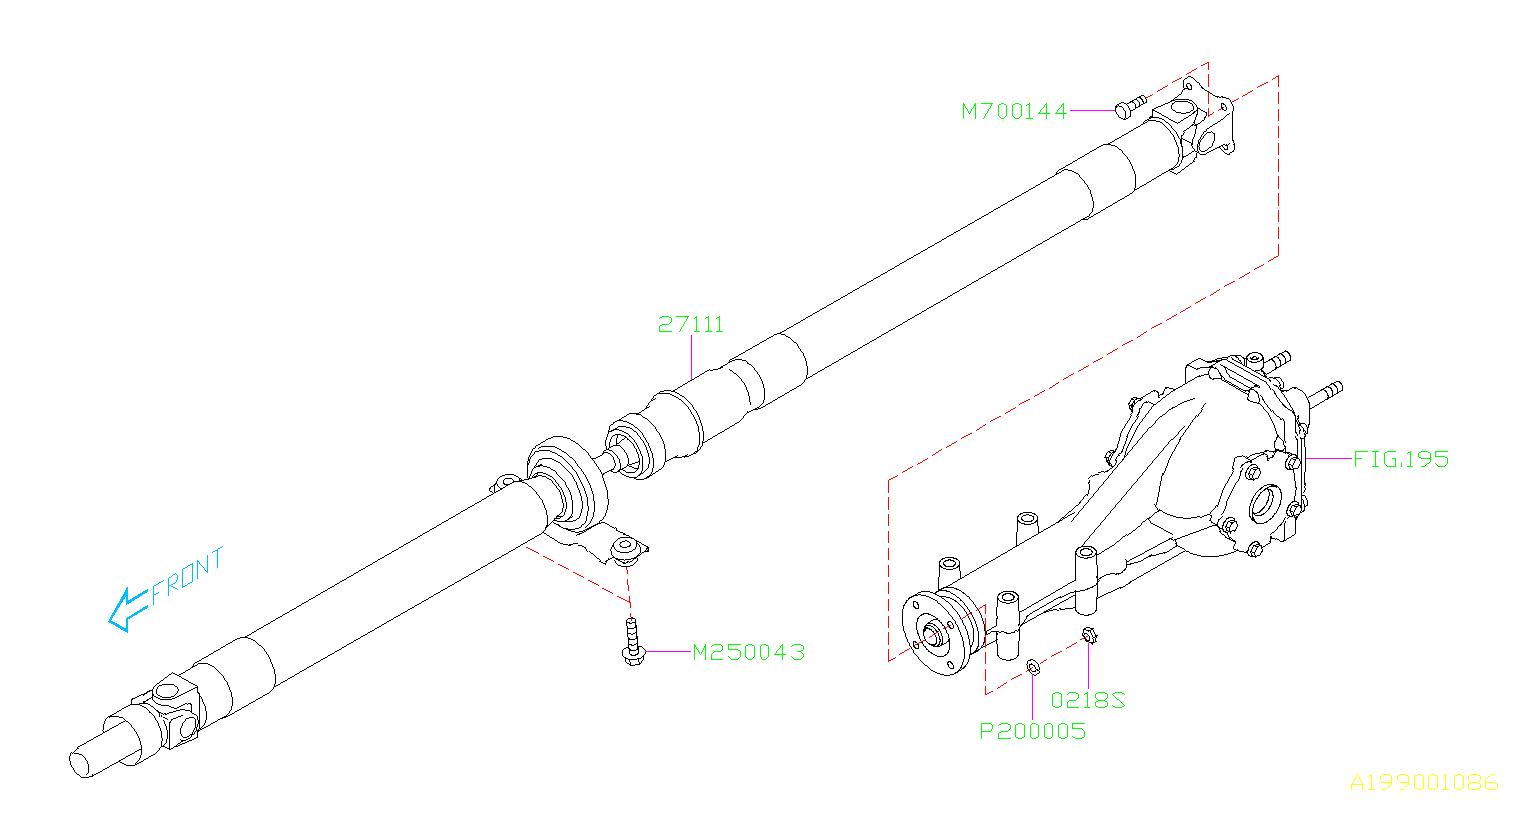 Subaru Impreza Propeller Shaft Assembly Driveline